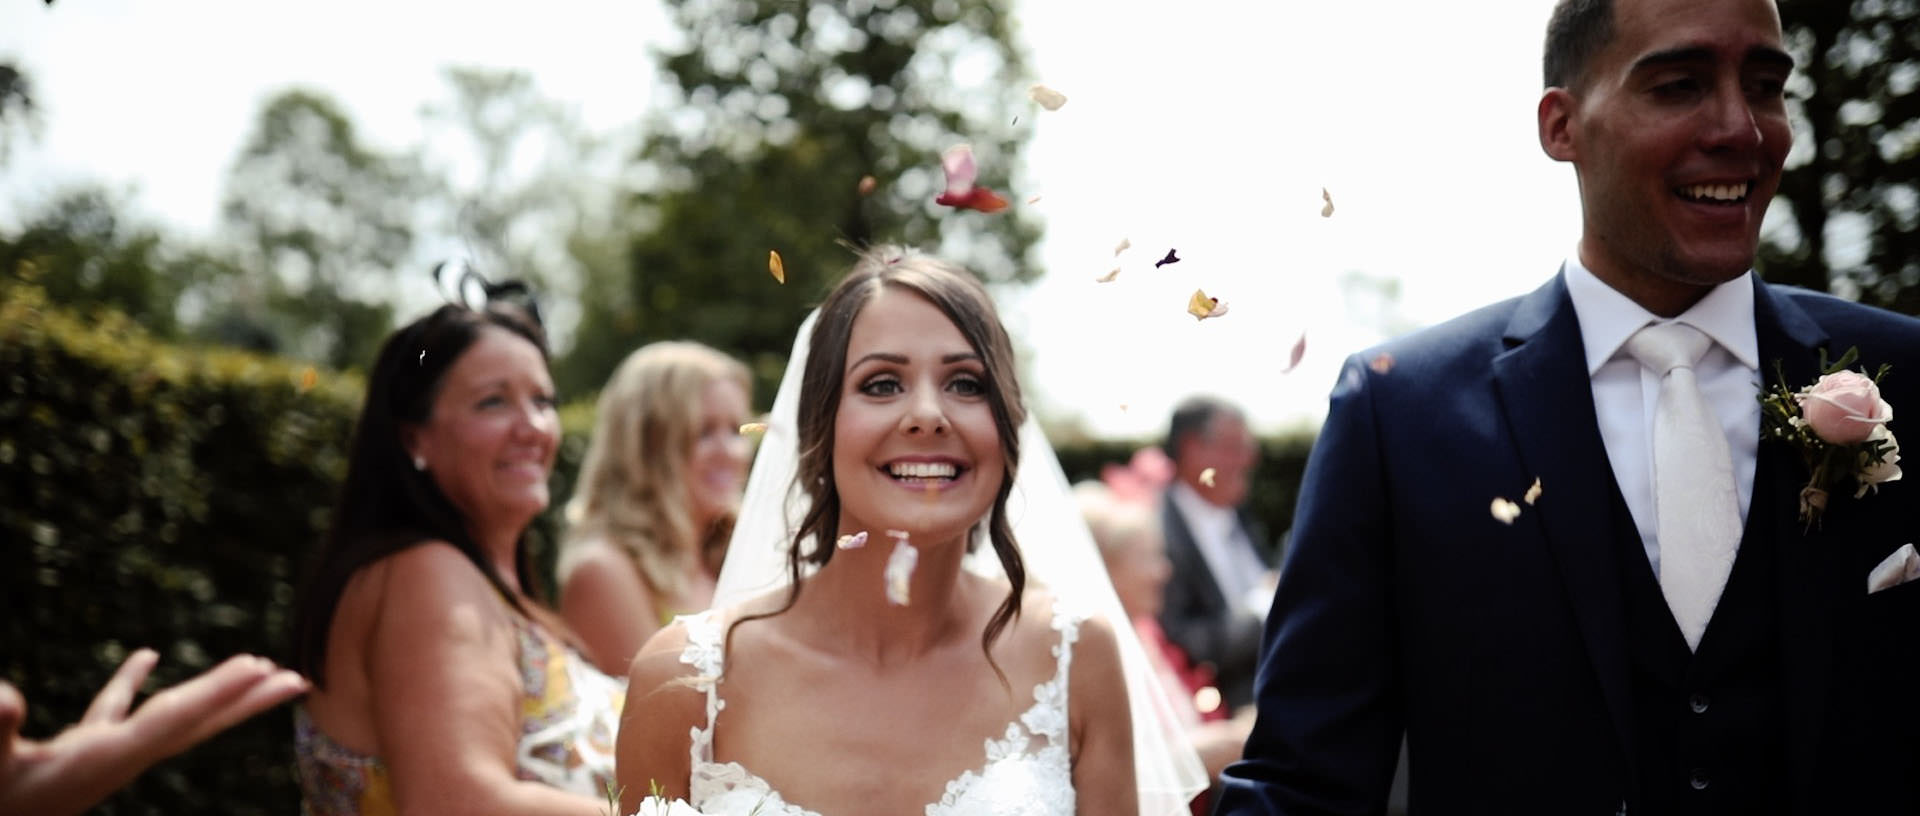 Hyde Barn Colswolds Wedding Verity-Jade & Kai 27 Cropped.jpg